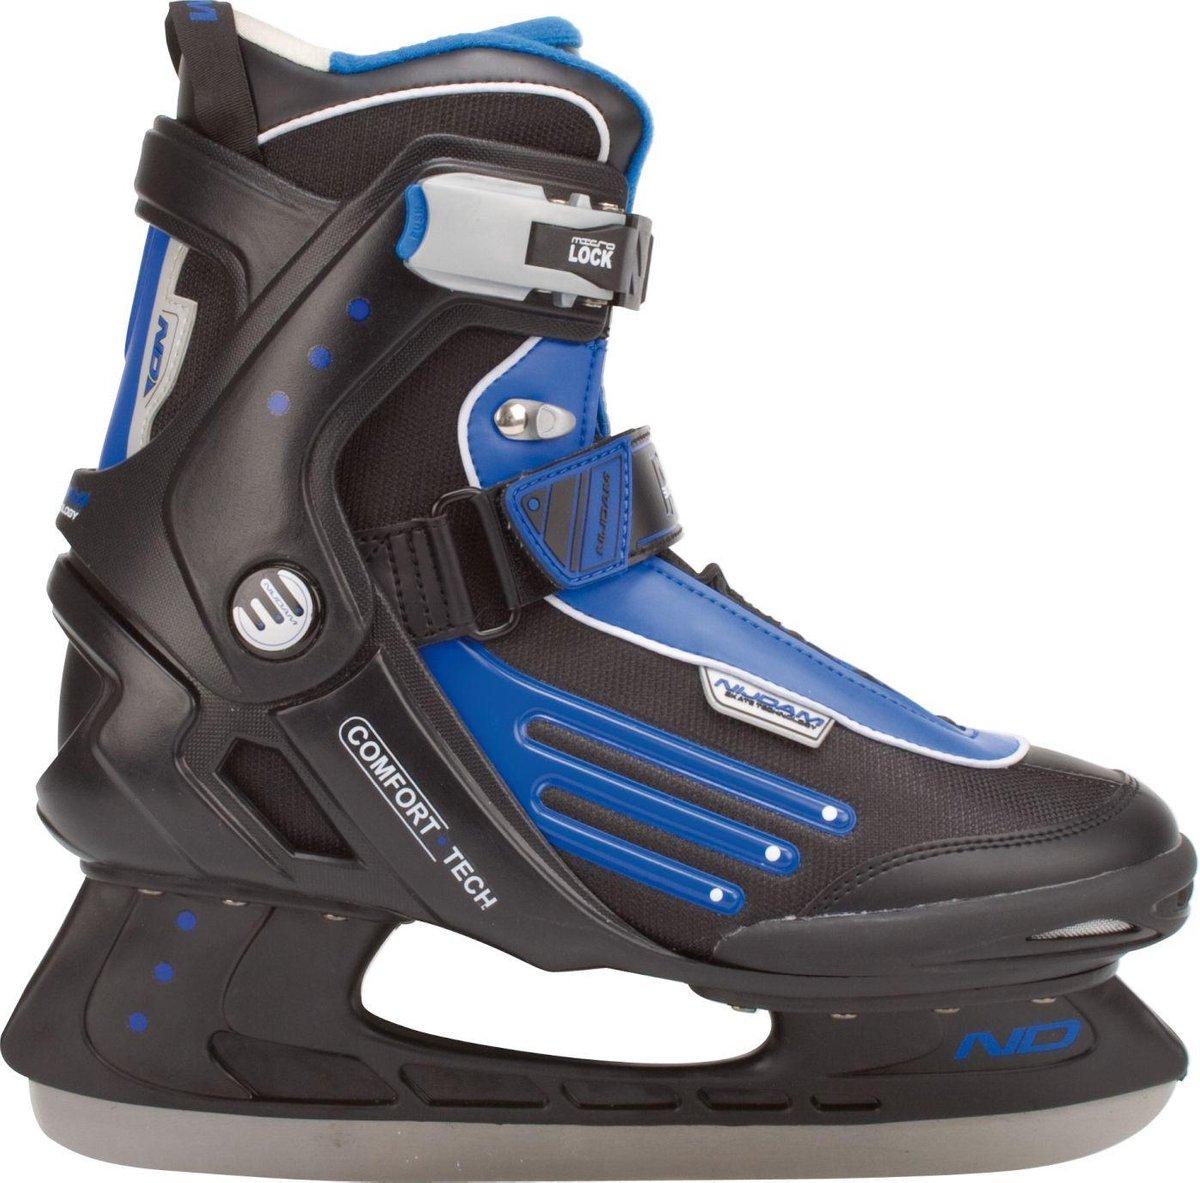 Nijdam IJshockeyschaats - Semi-Softboot - Zwart/Blauw/Zilver - 41